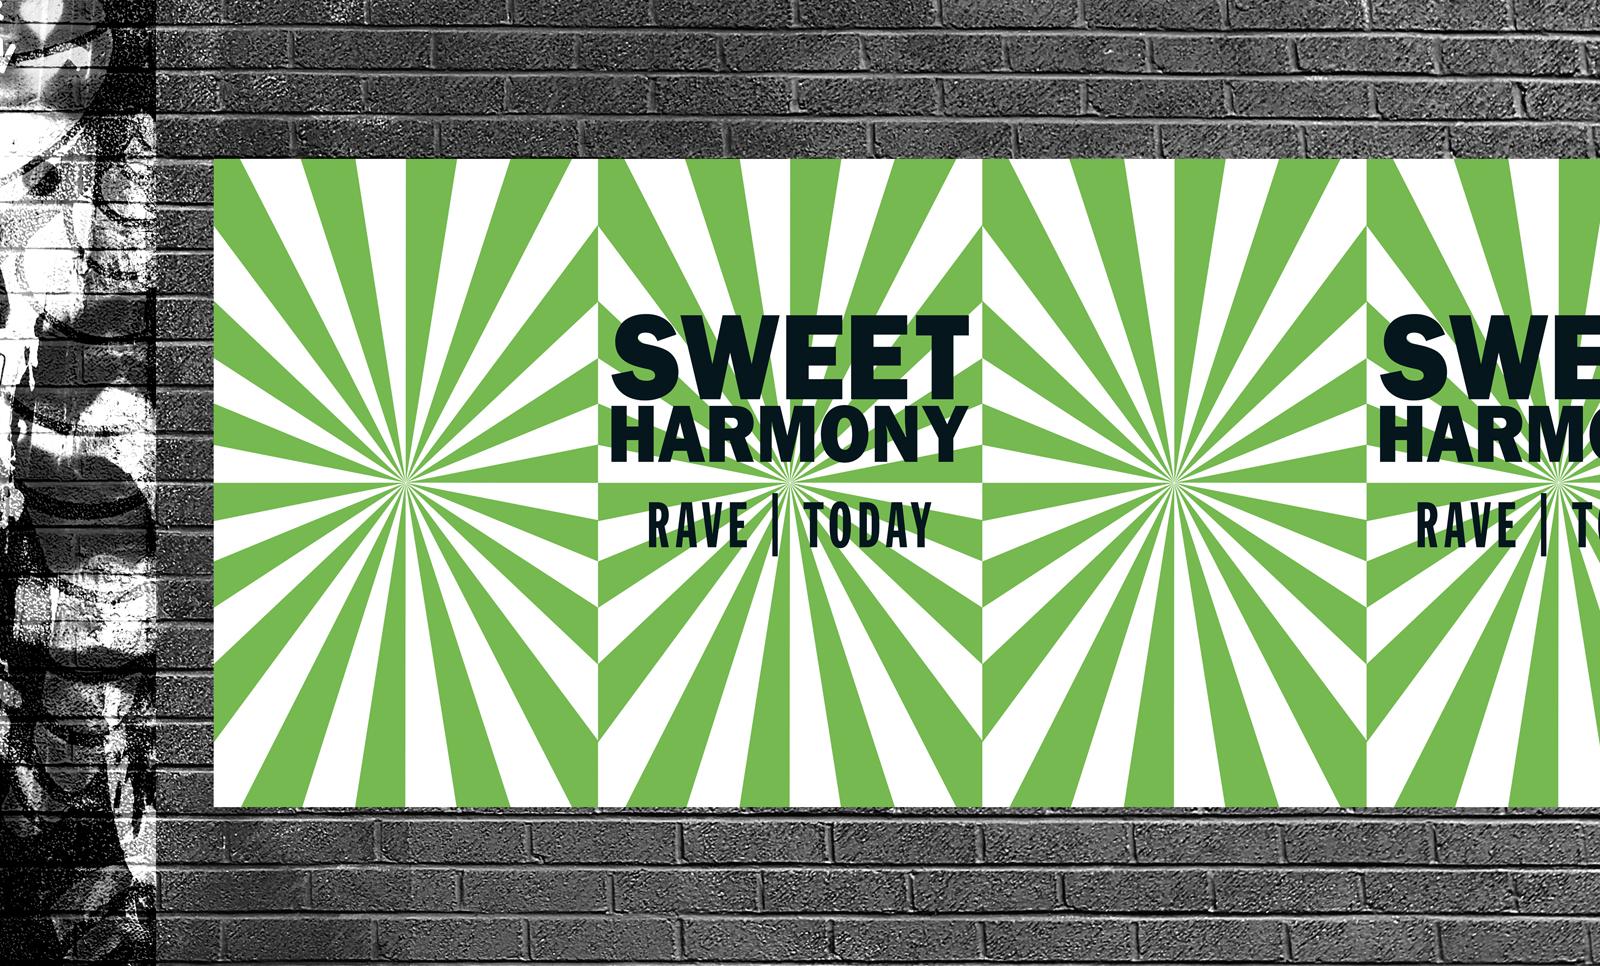 Sweet-Harmony-Saatchi-Gallery-Rave-Today-Teaser-48Sheet-Pavement-Licker.jpg